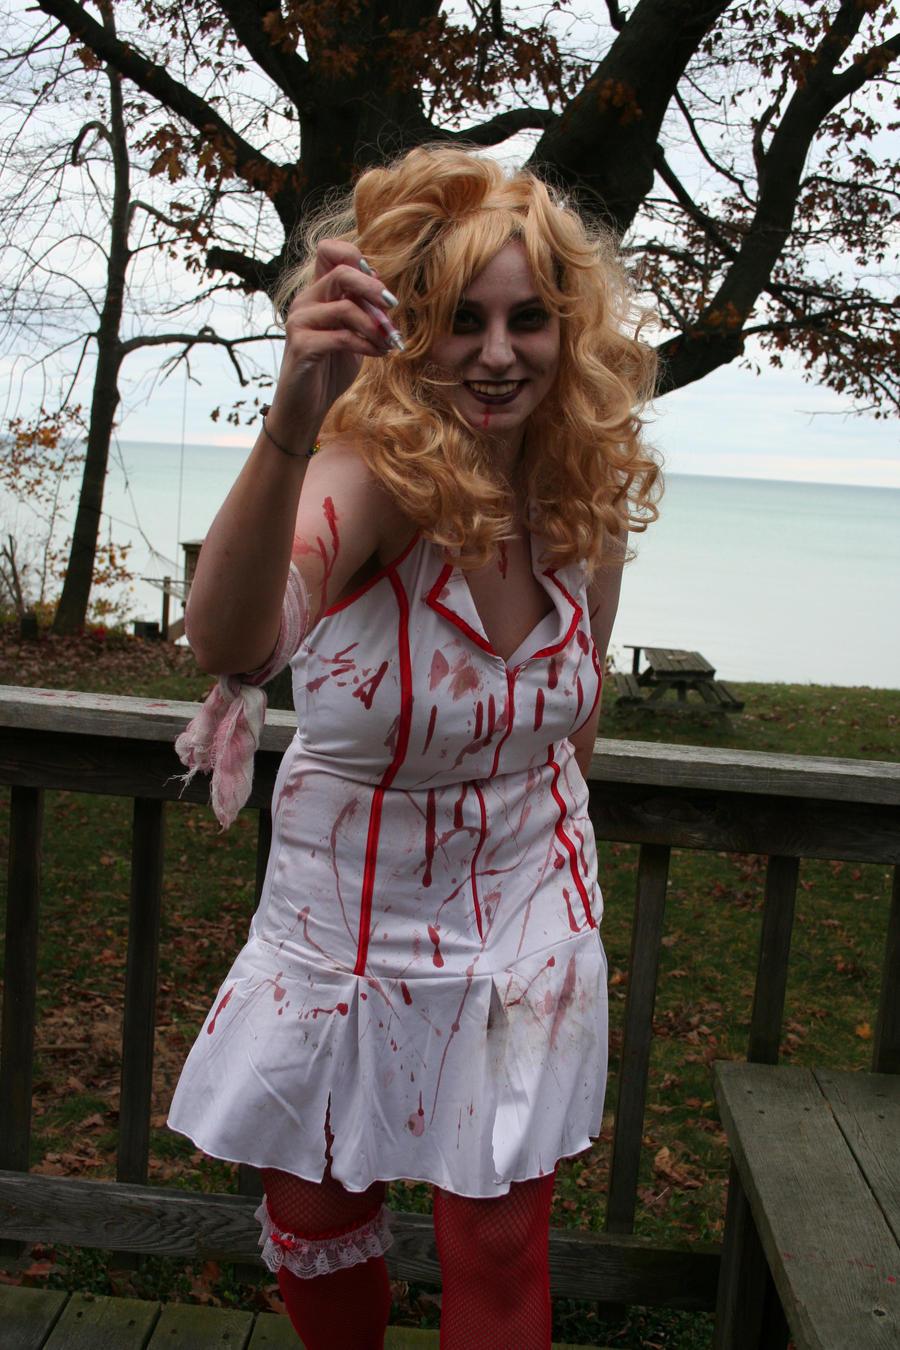 http://fc08.deviantart.net/fs51/i/2009/308/8/7/Attack_of_the_Zombie_Nurse_by_KouranKiyo.jpg